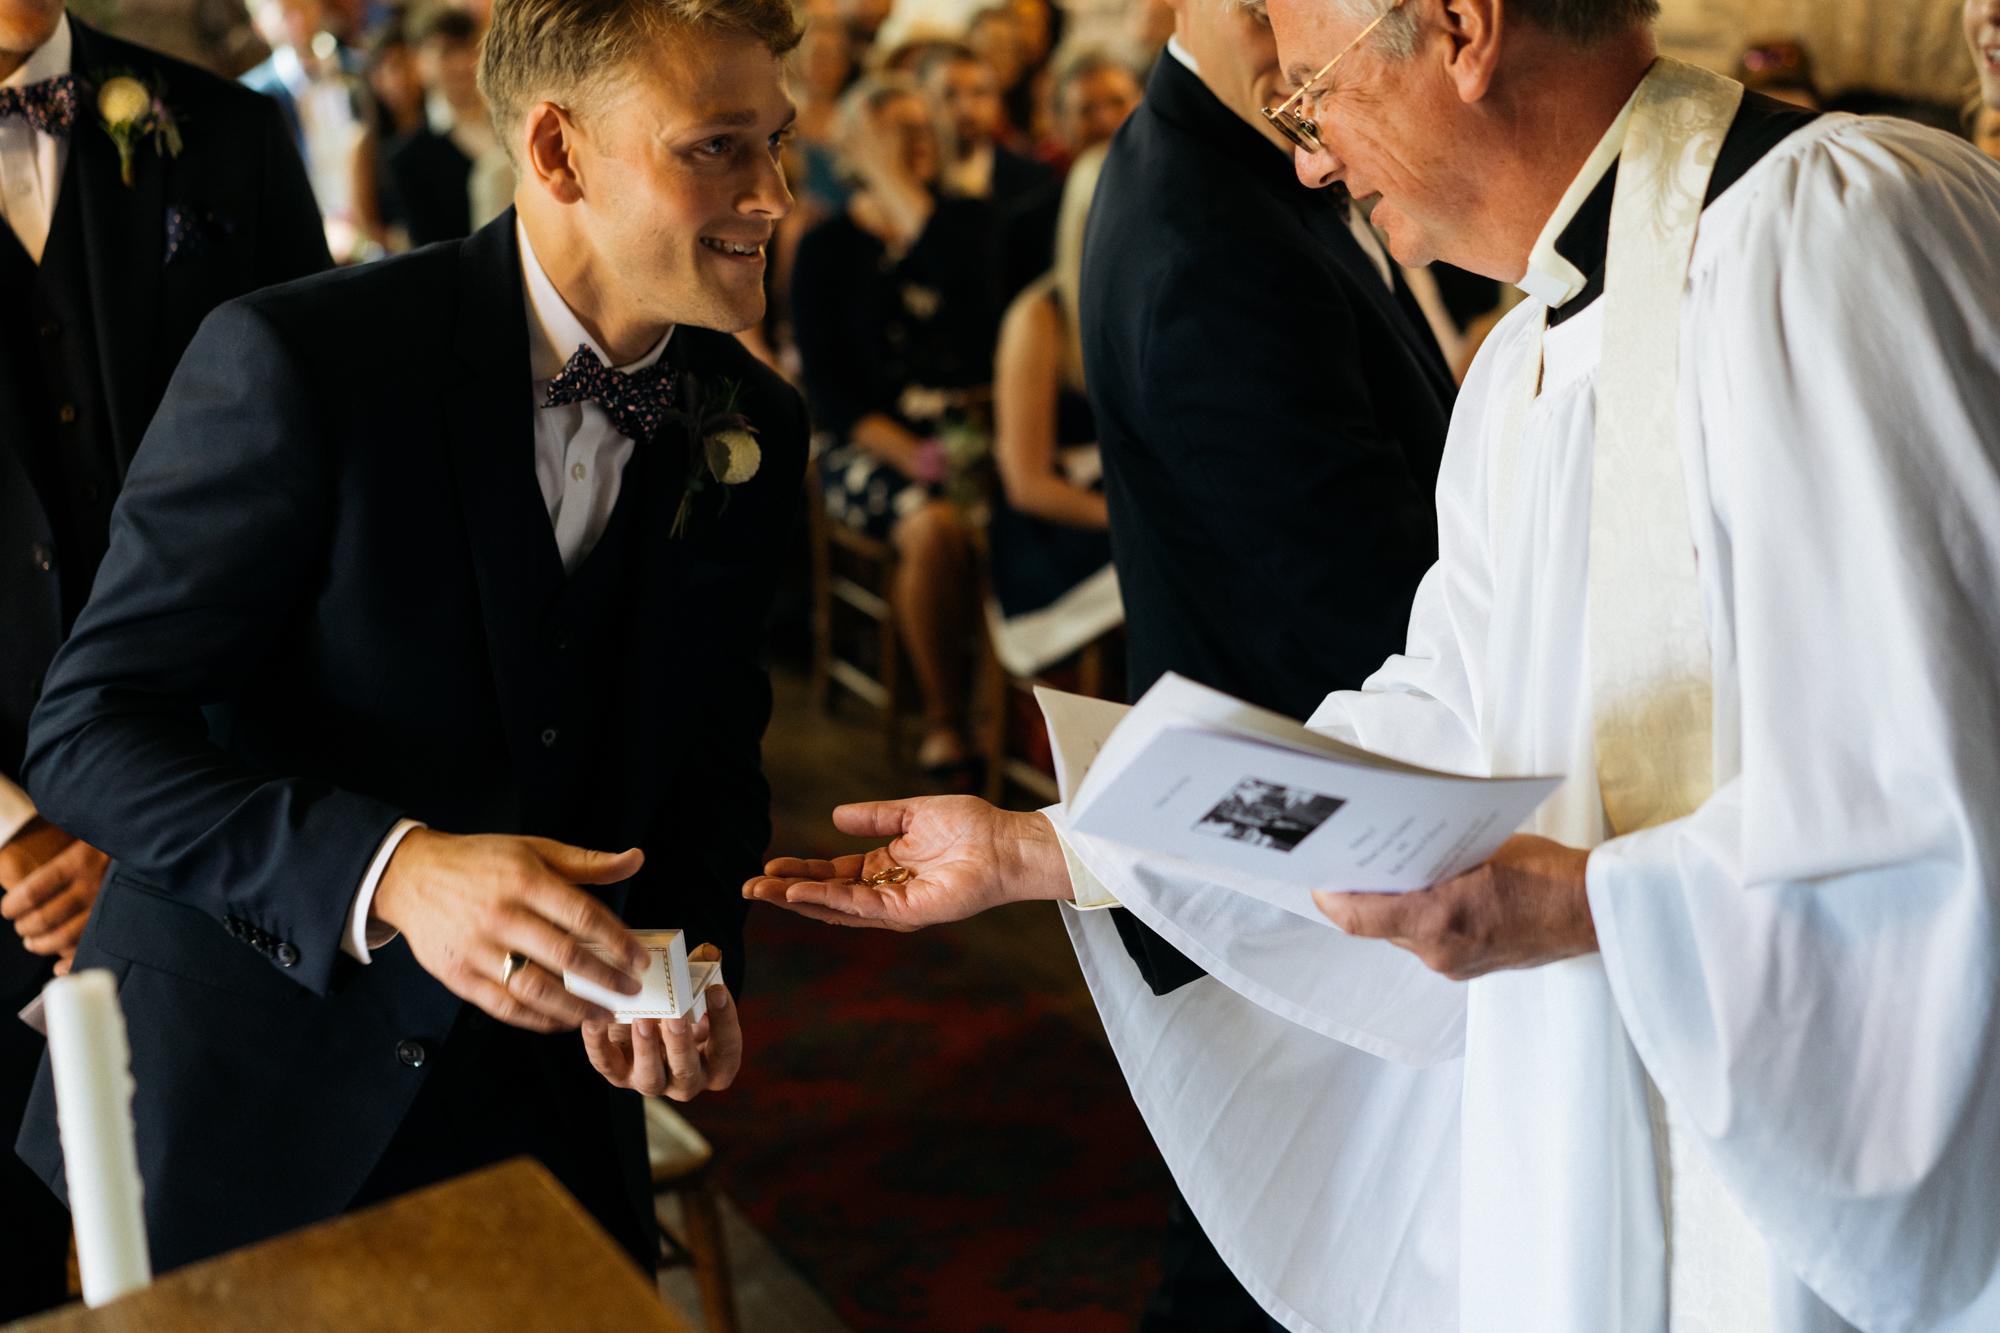 Handing over the rings